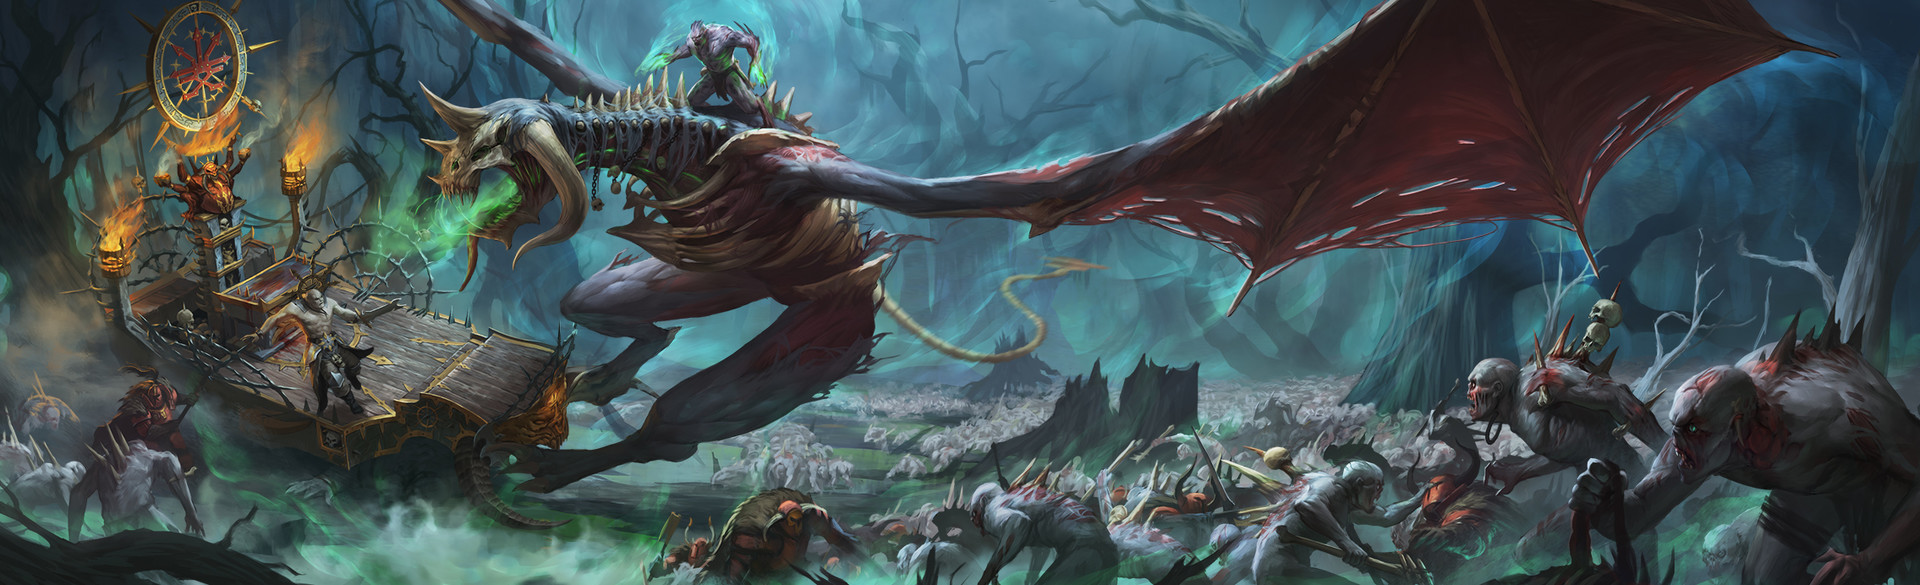 akim-kaliberda-flesheater-court-vs-khorne-chaos-warriors